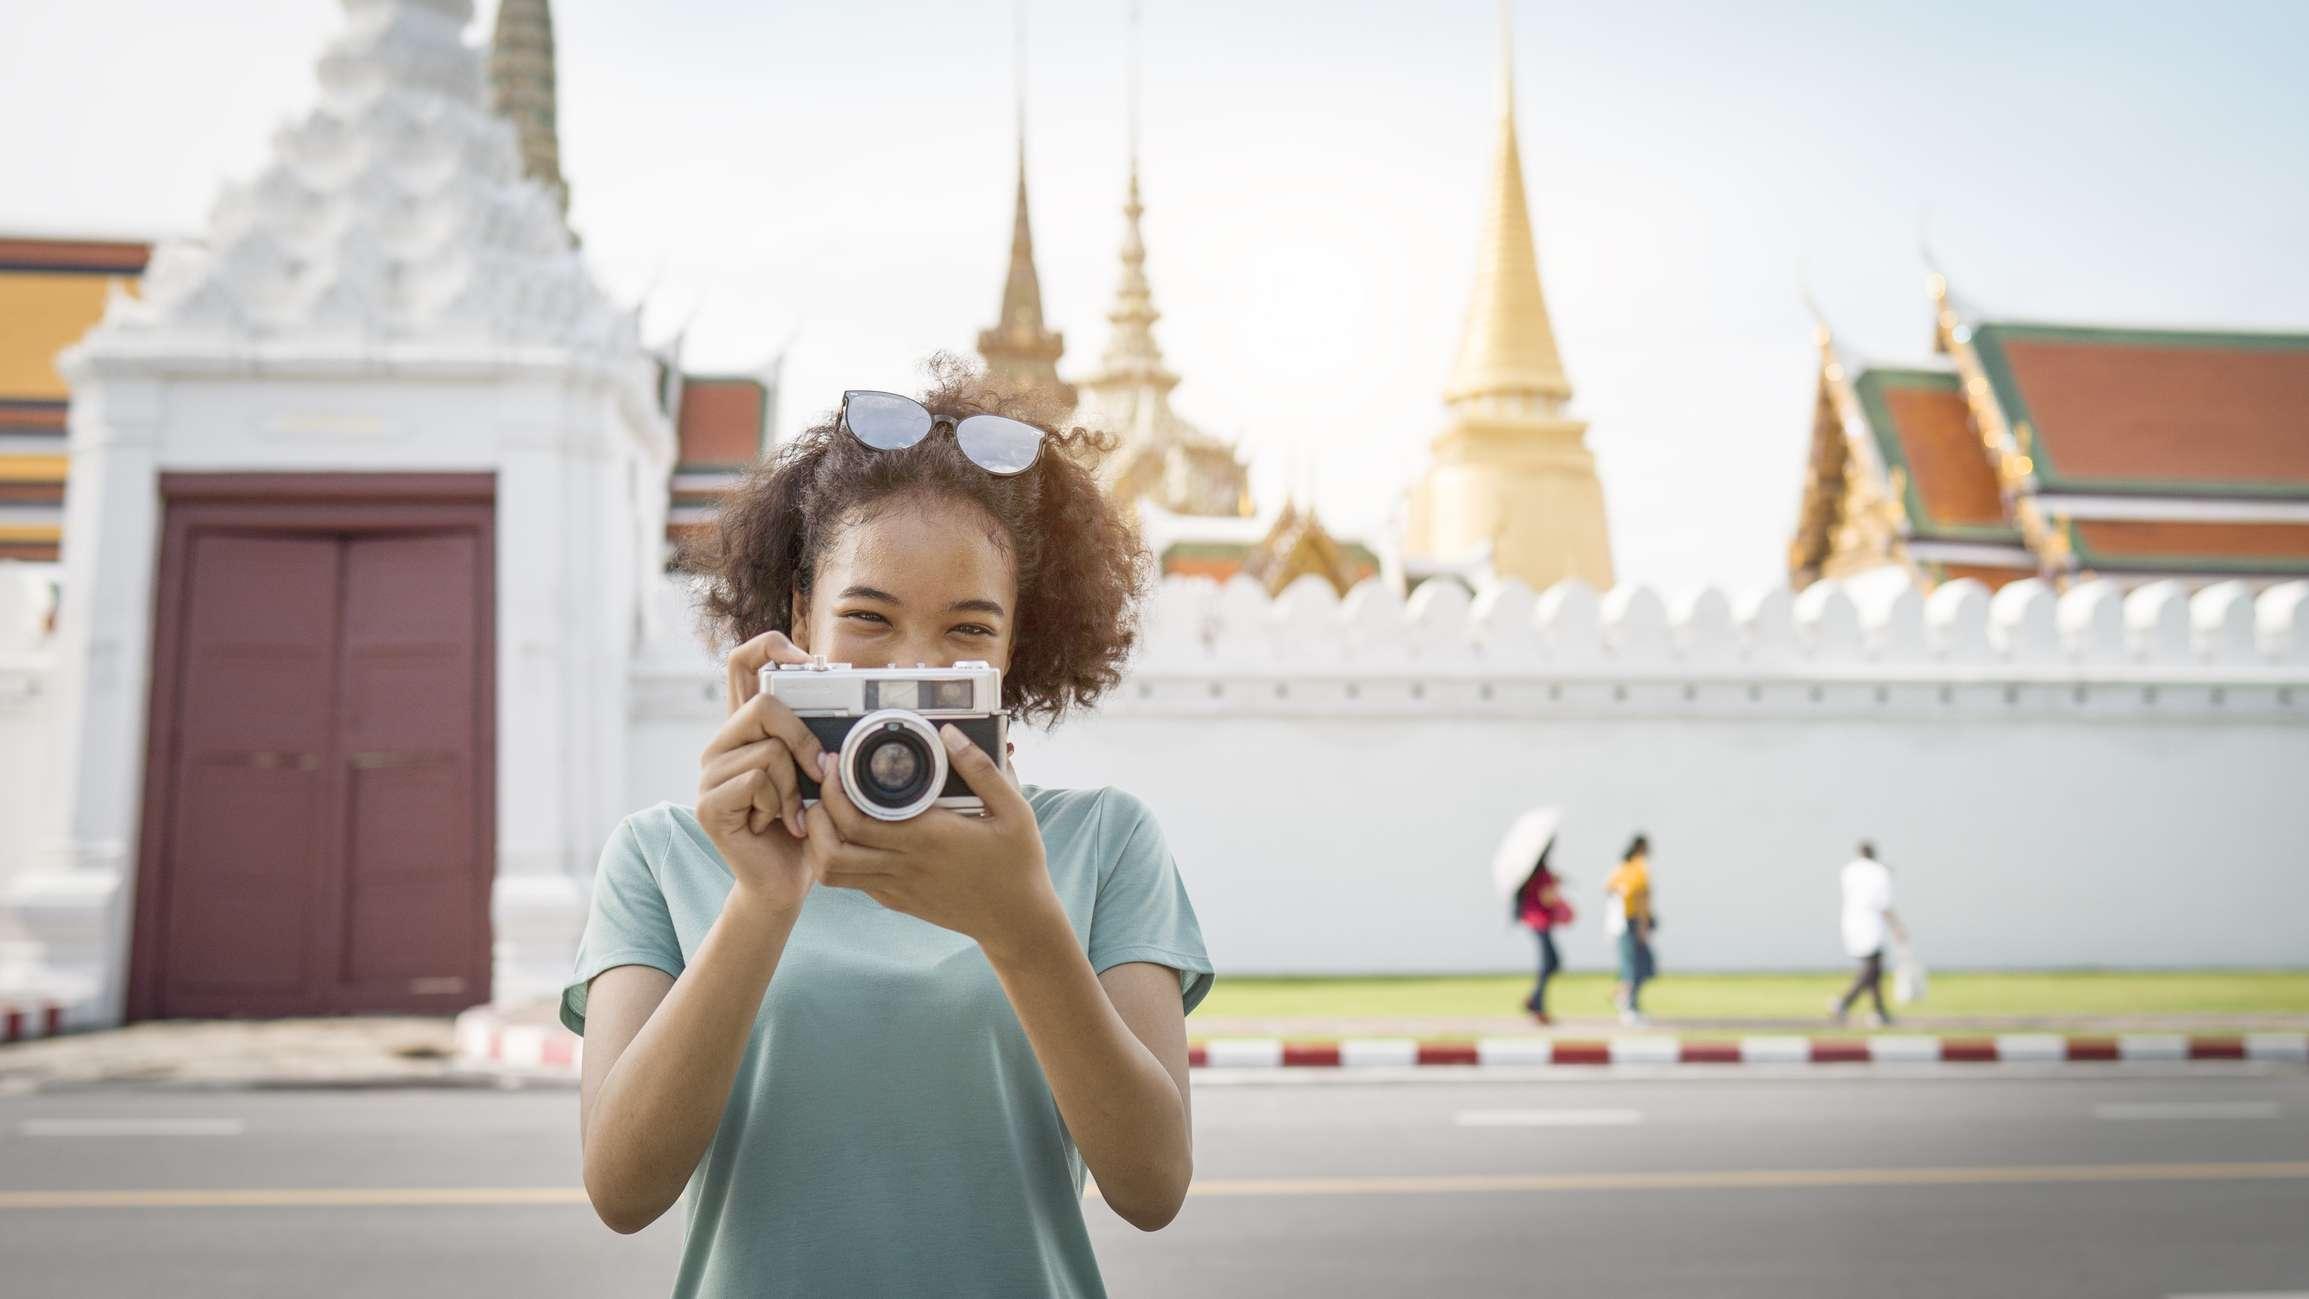 African-American tourist in Bangkok, Thailand